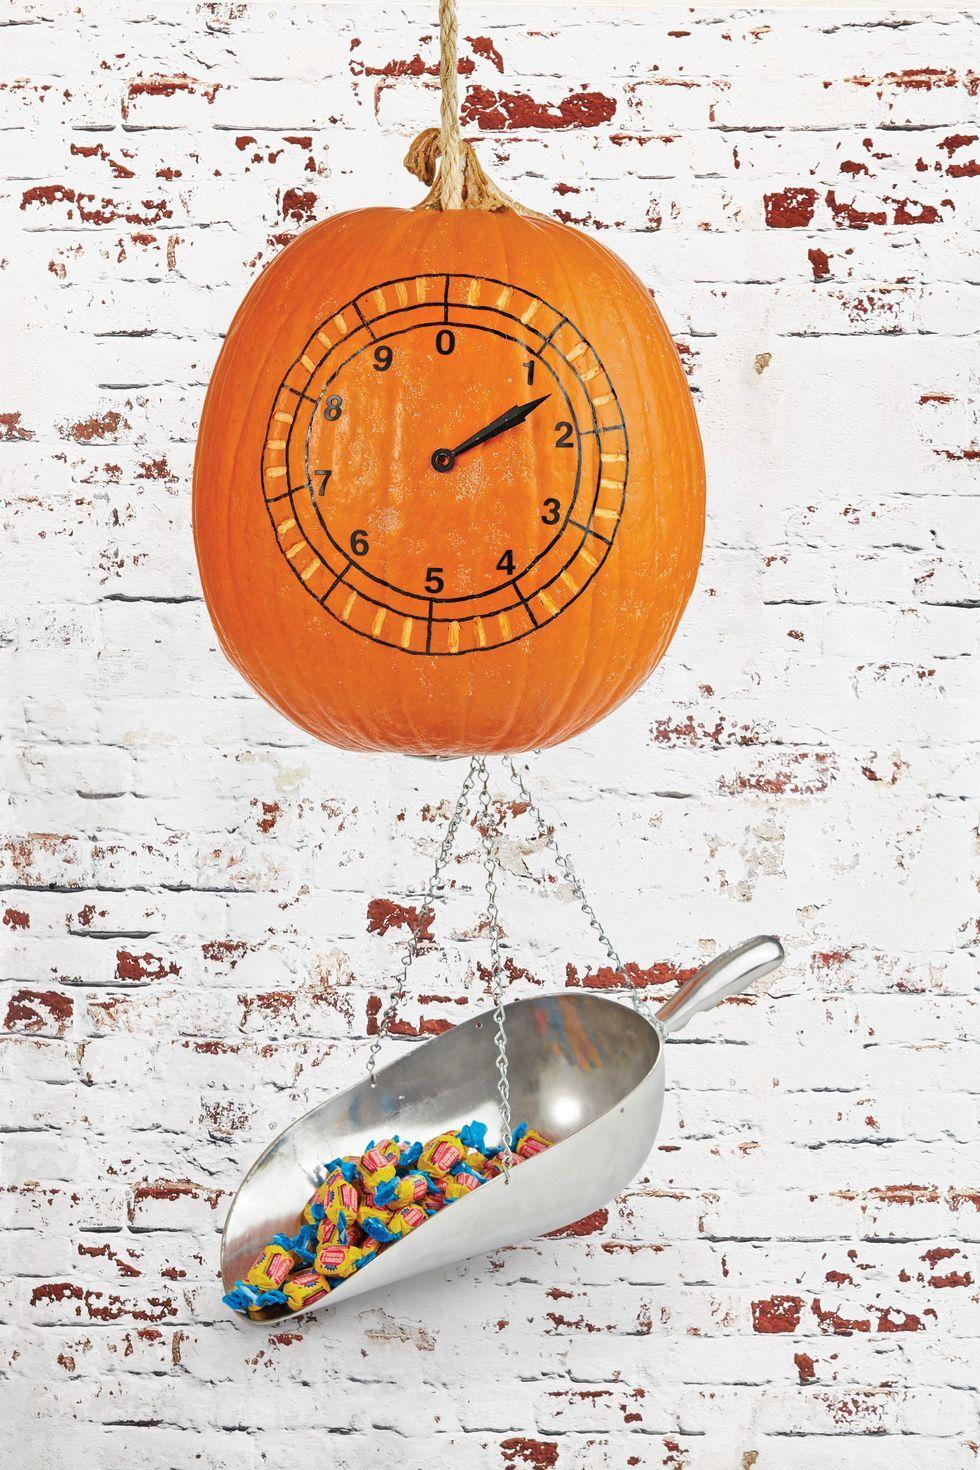 69 Easy DIY Halloween Decorations Homemade Do It Yourself